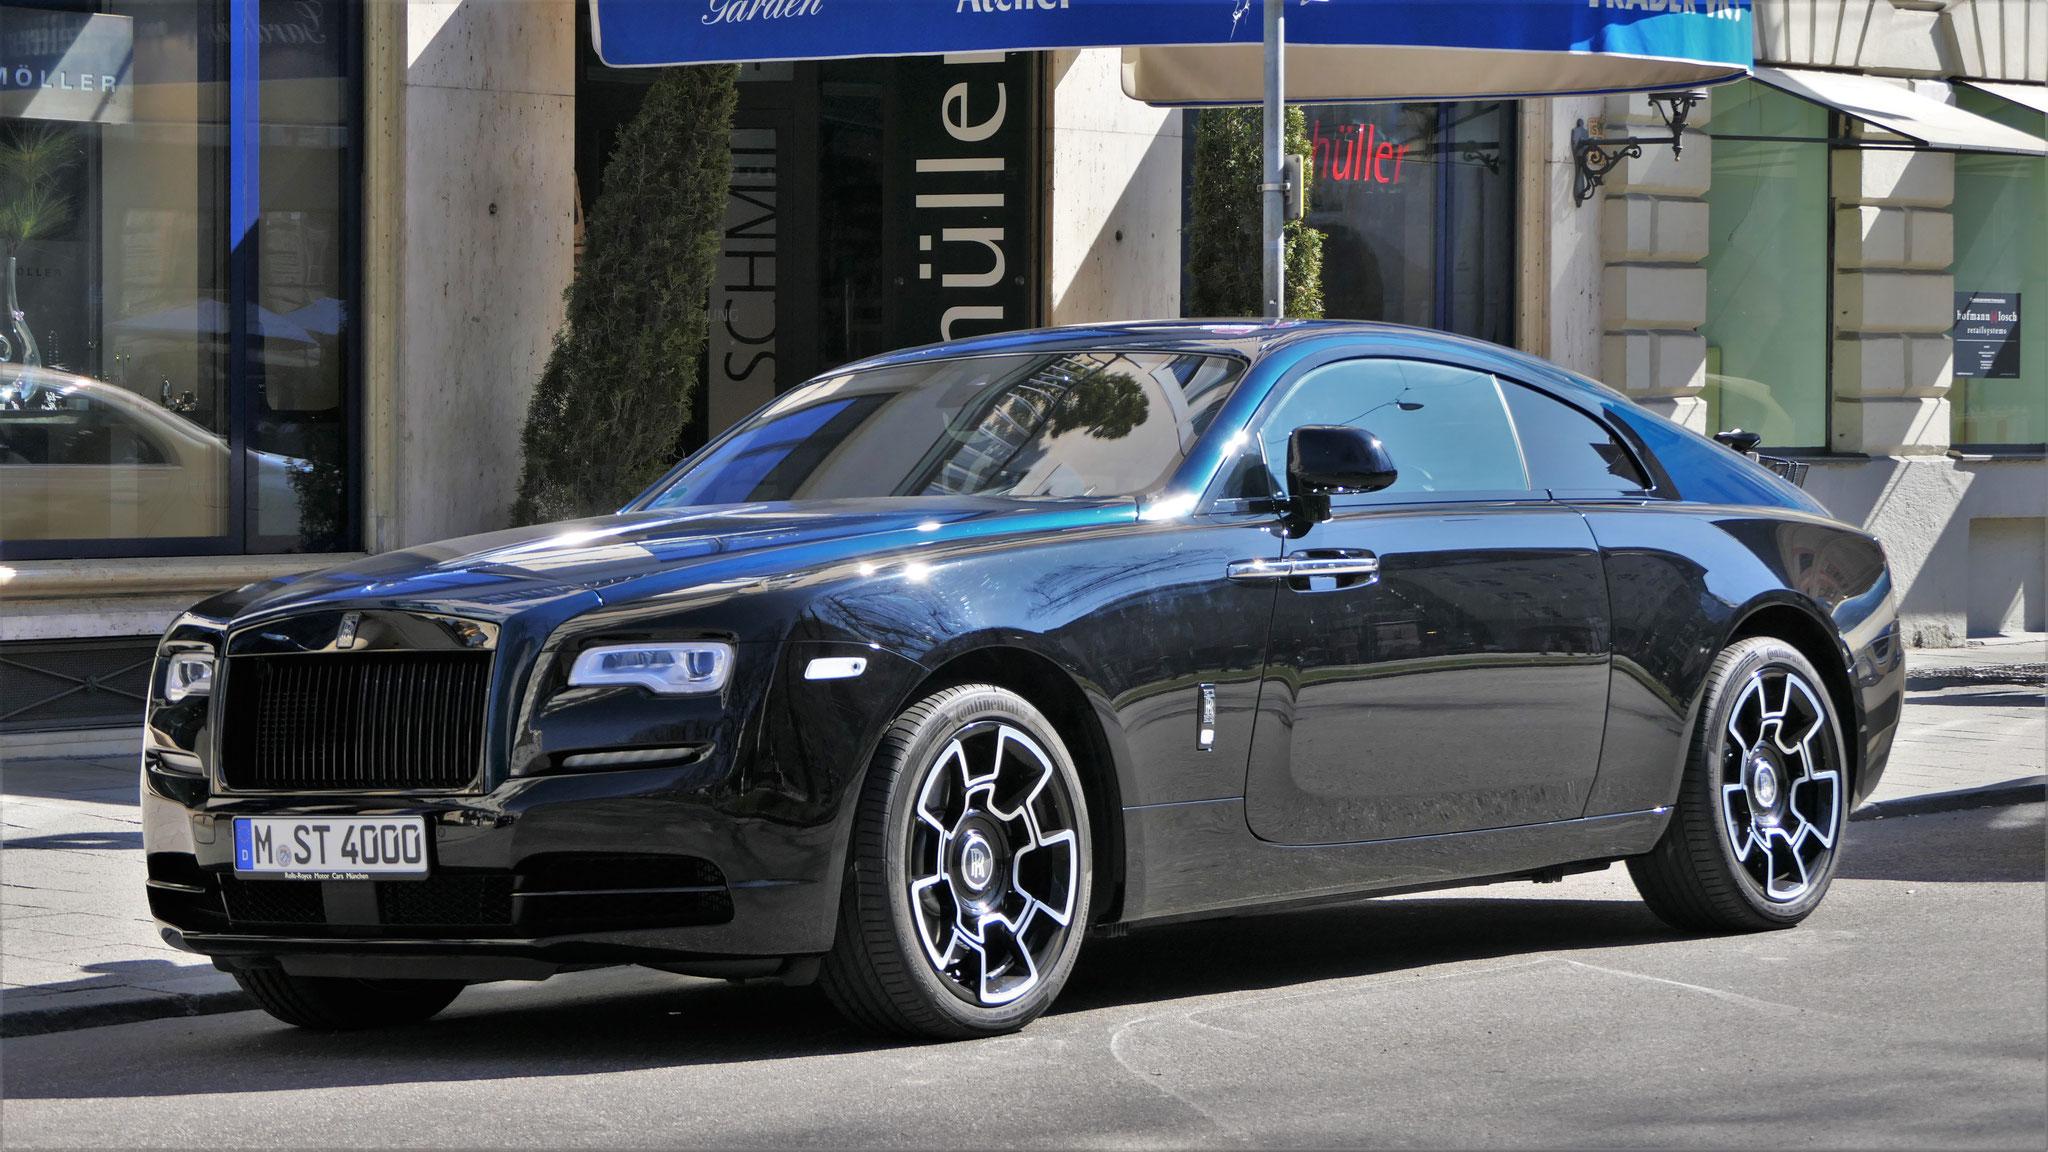 Rolls Royce Wraith Black Badge - M-ST-4000